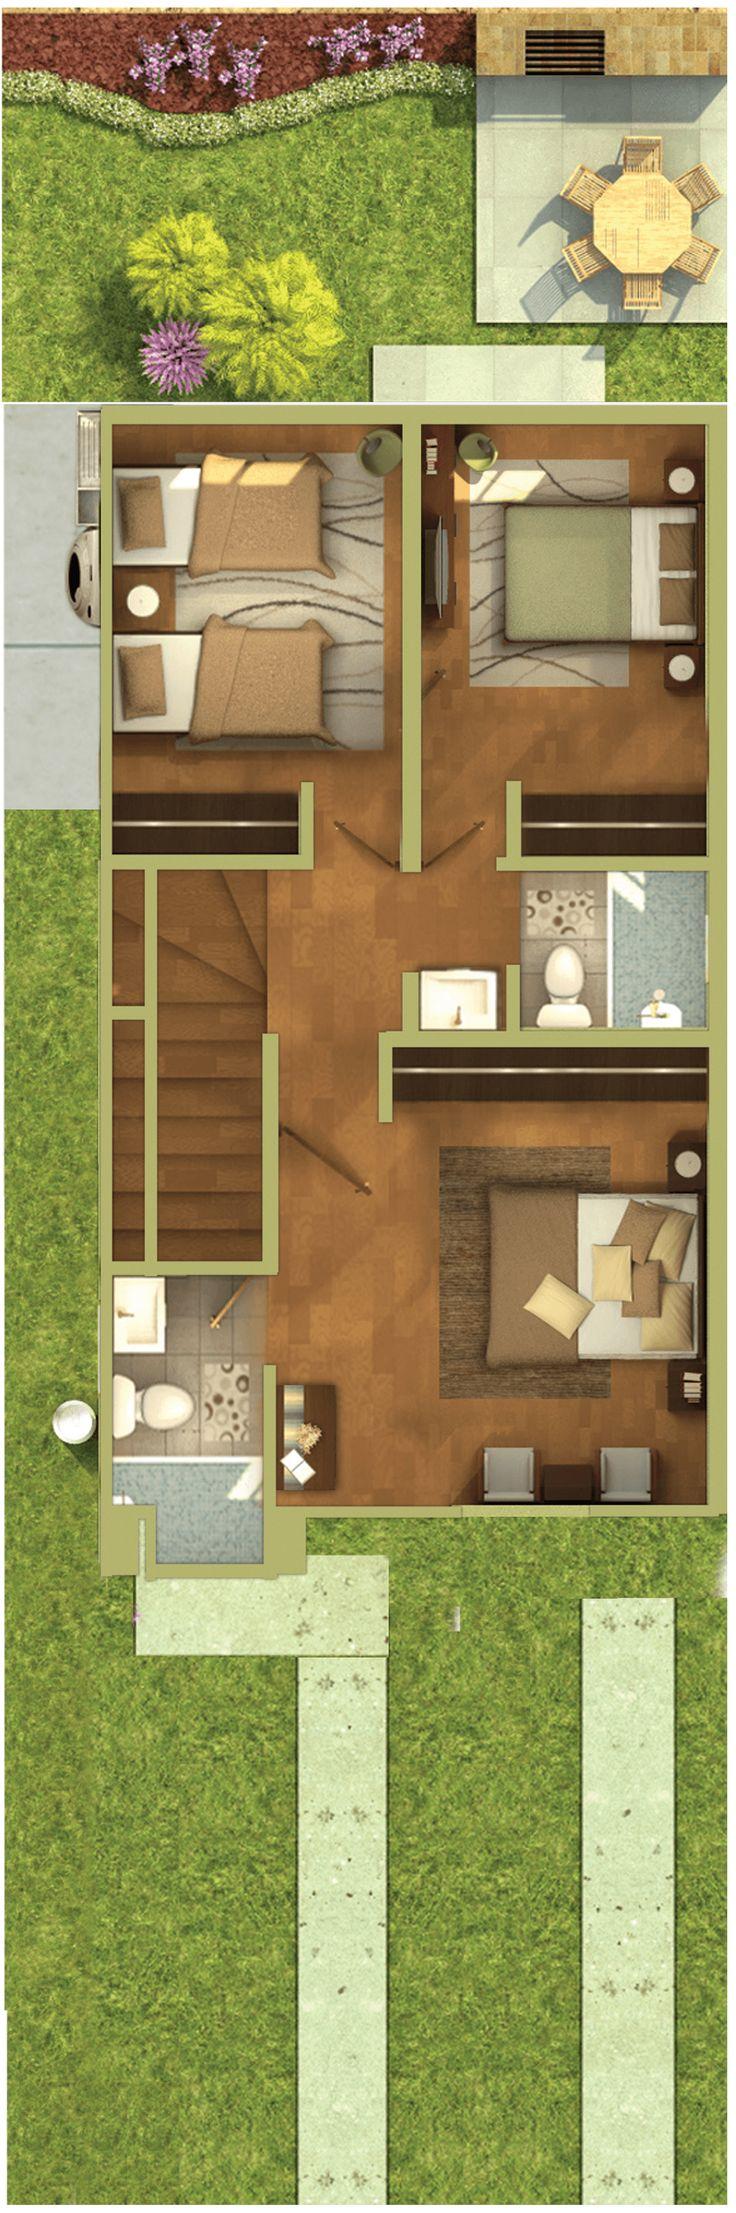 Planta Alta Modern House PlansHouse